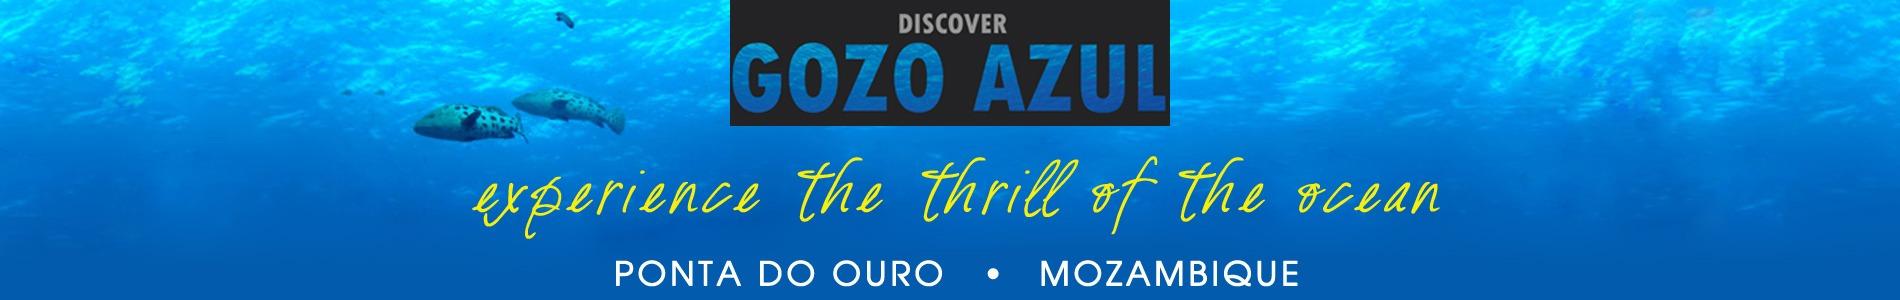 Discover Gozo Azul